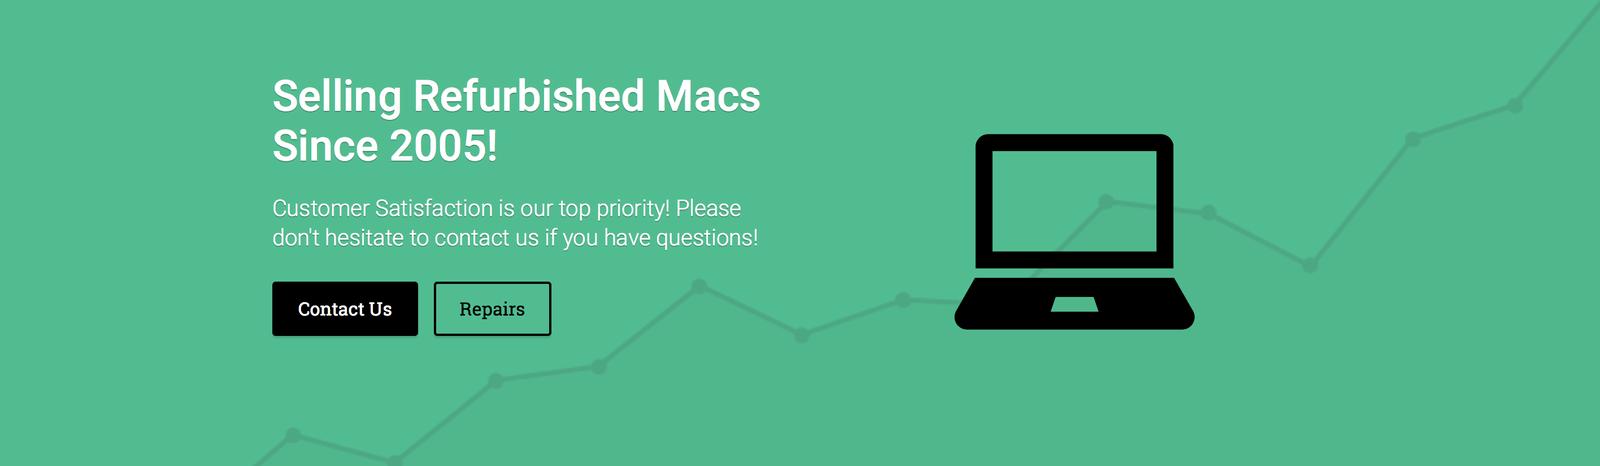 MacFulfillmentServices